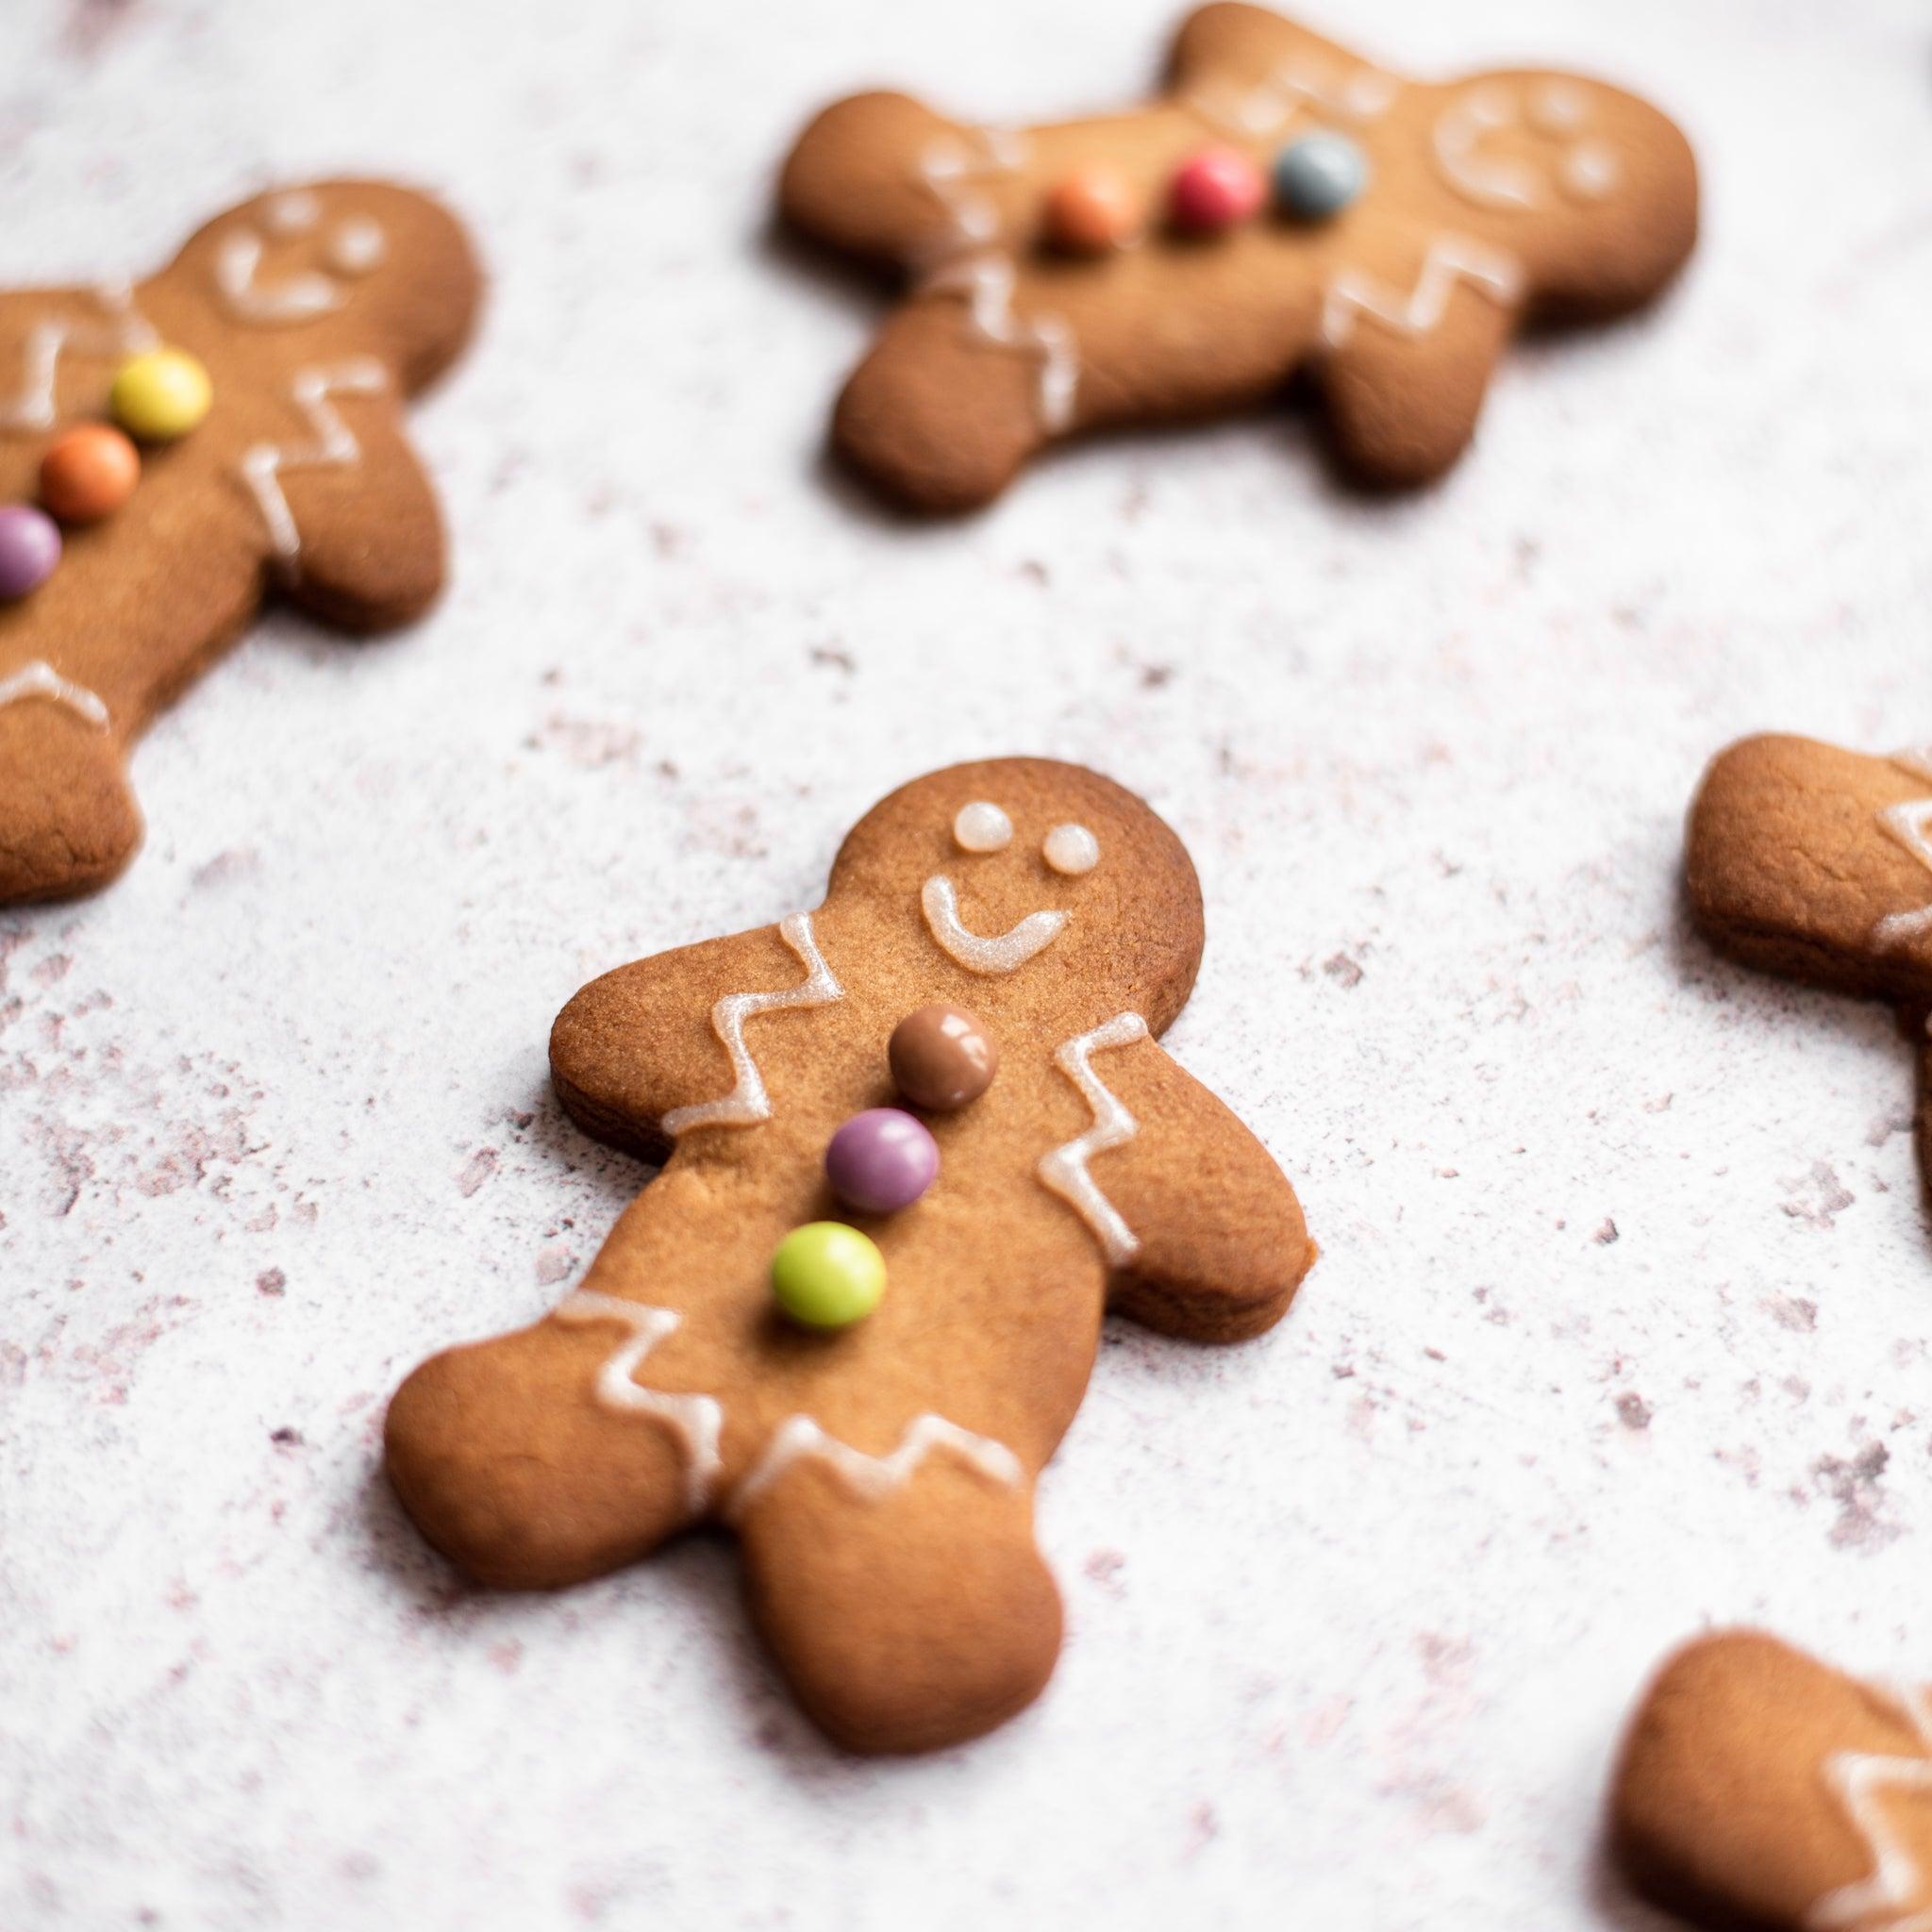 Ultimate-Gingerbread-SQUARE-2.jpg